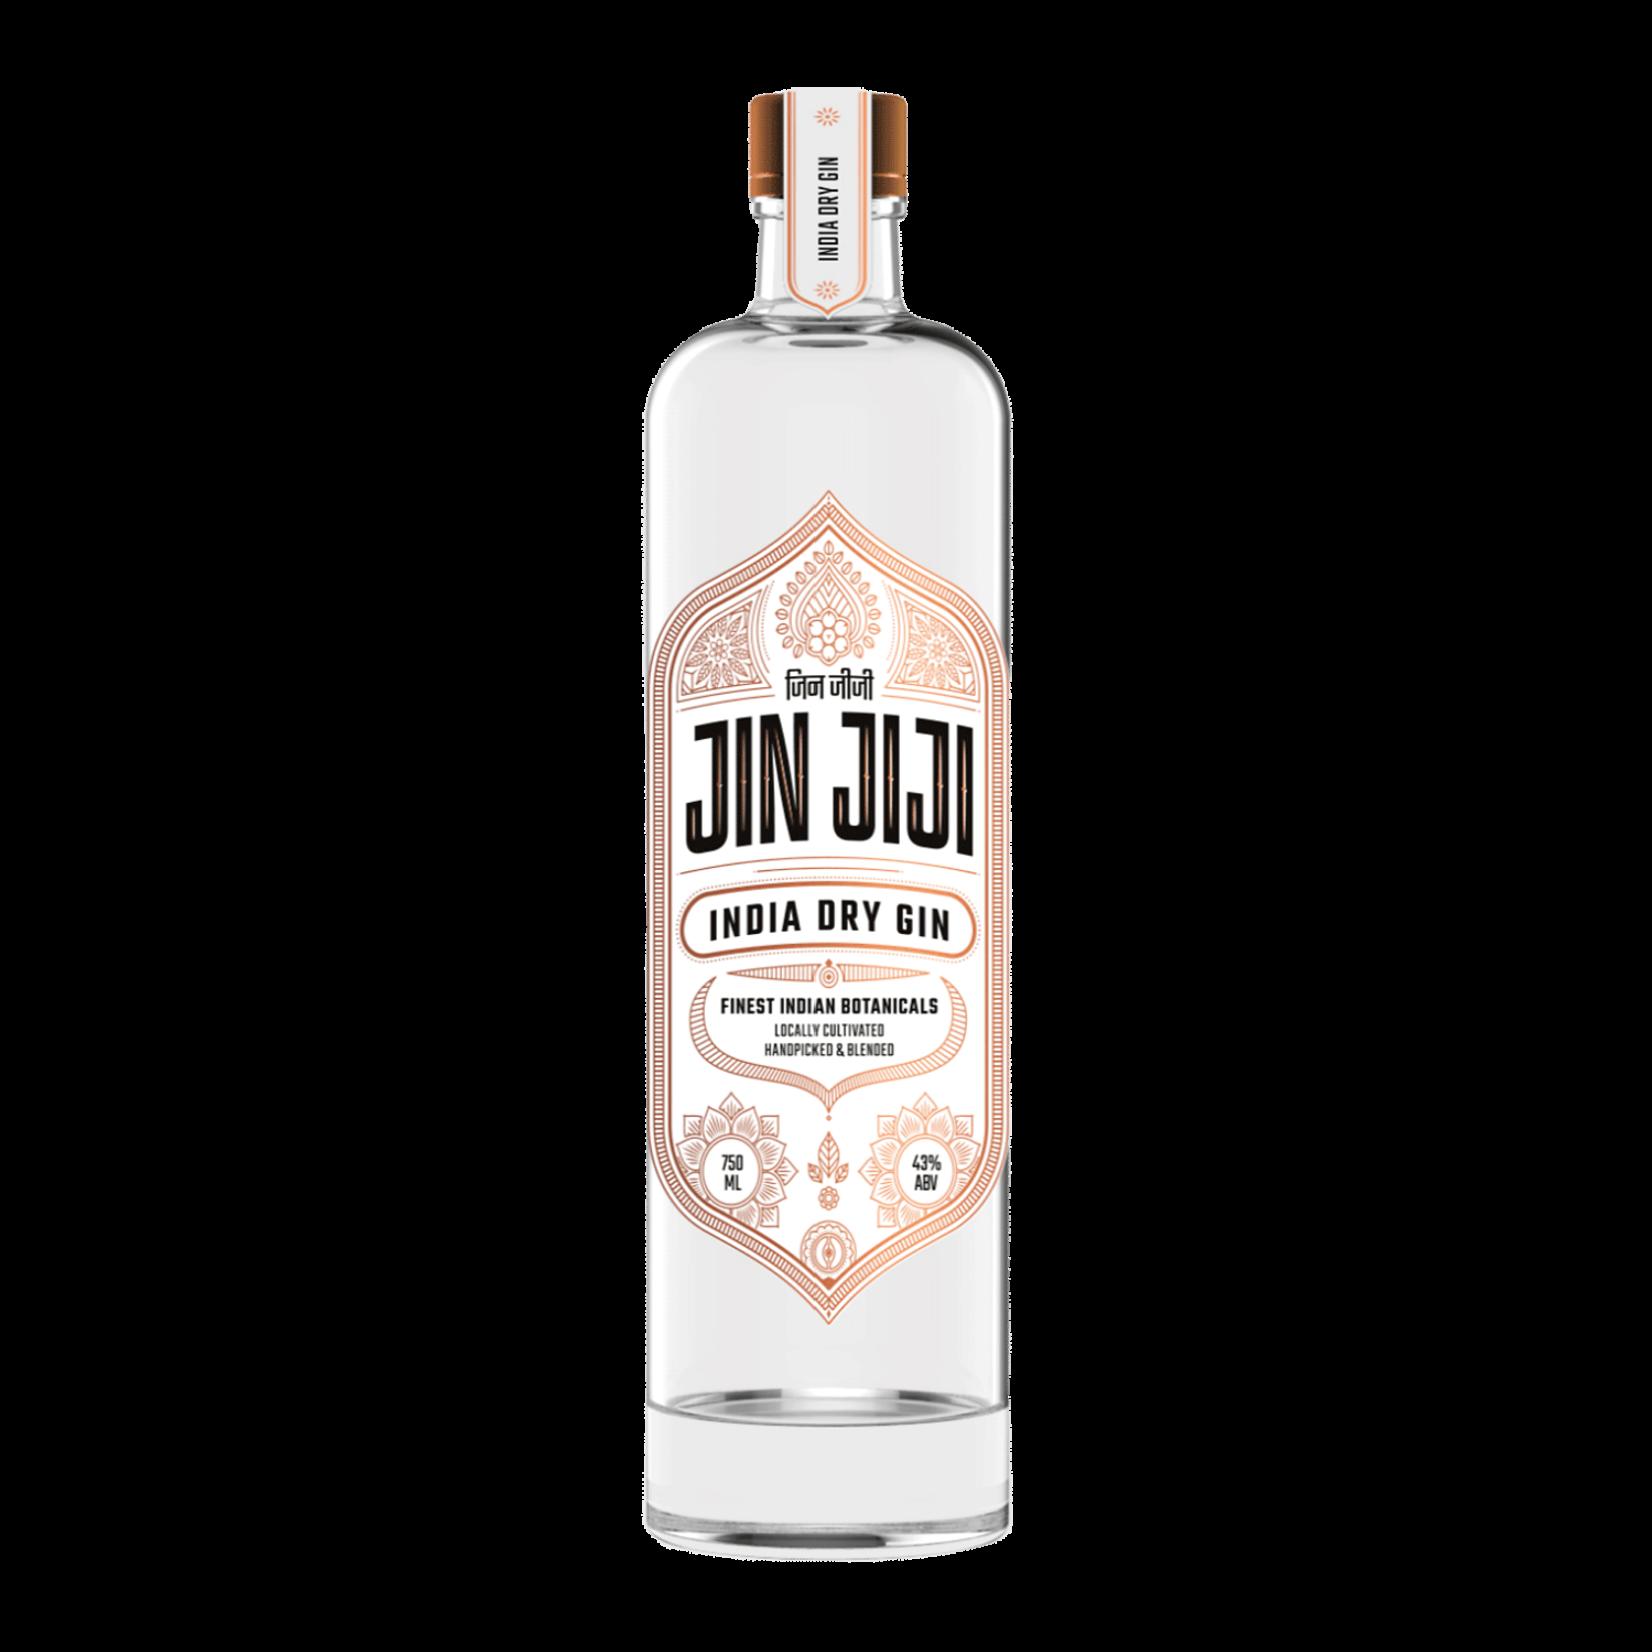 Spirits Jin Jiji India Dry Gin